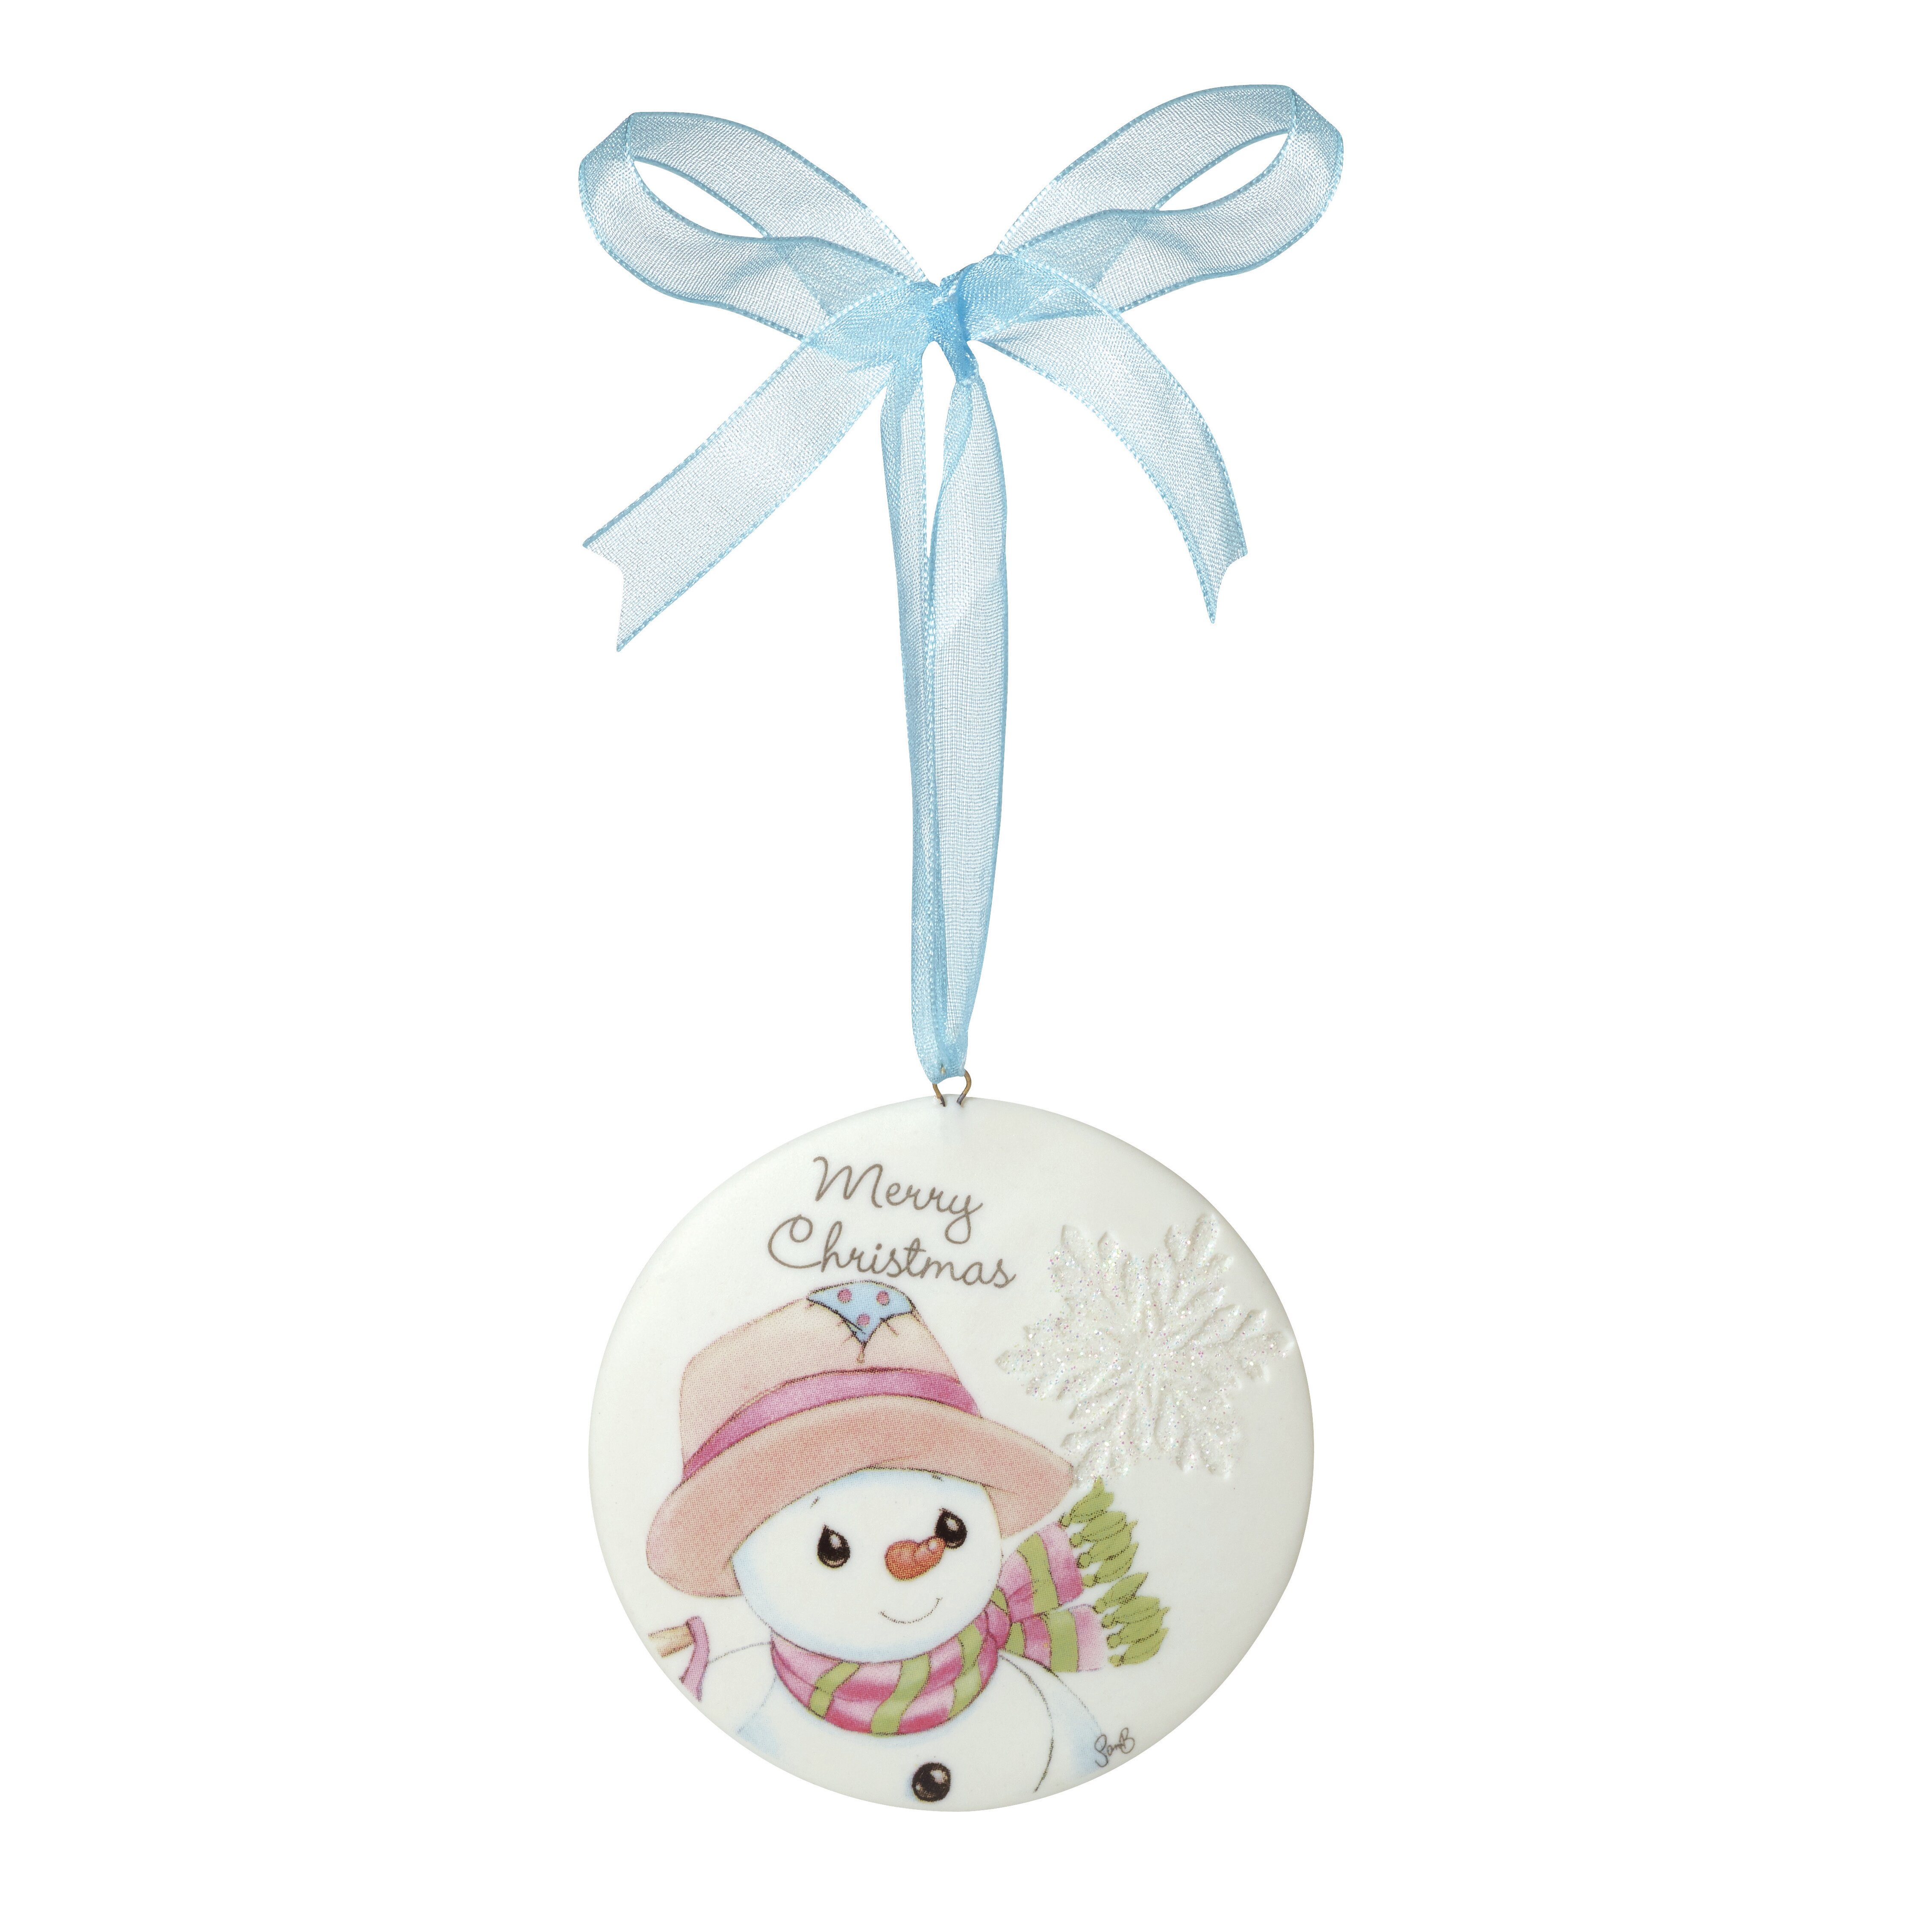 Merry Christmas Ornaments: Precious Moments Merry Christmas Ornament